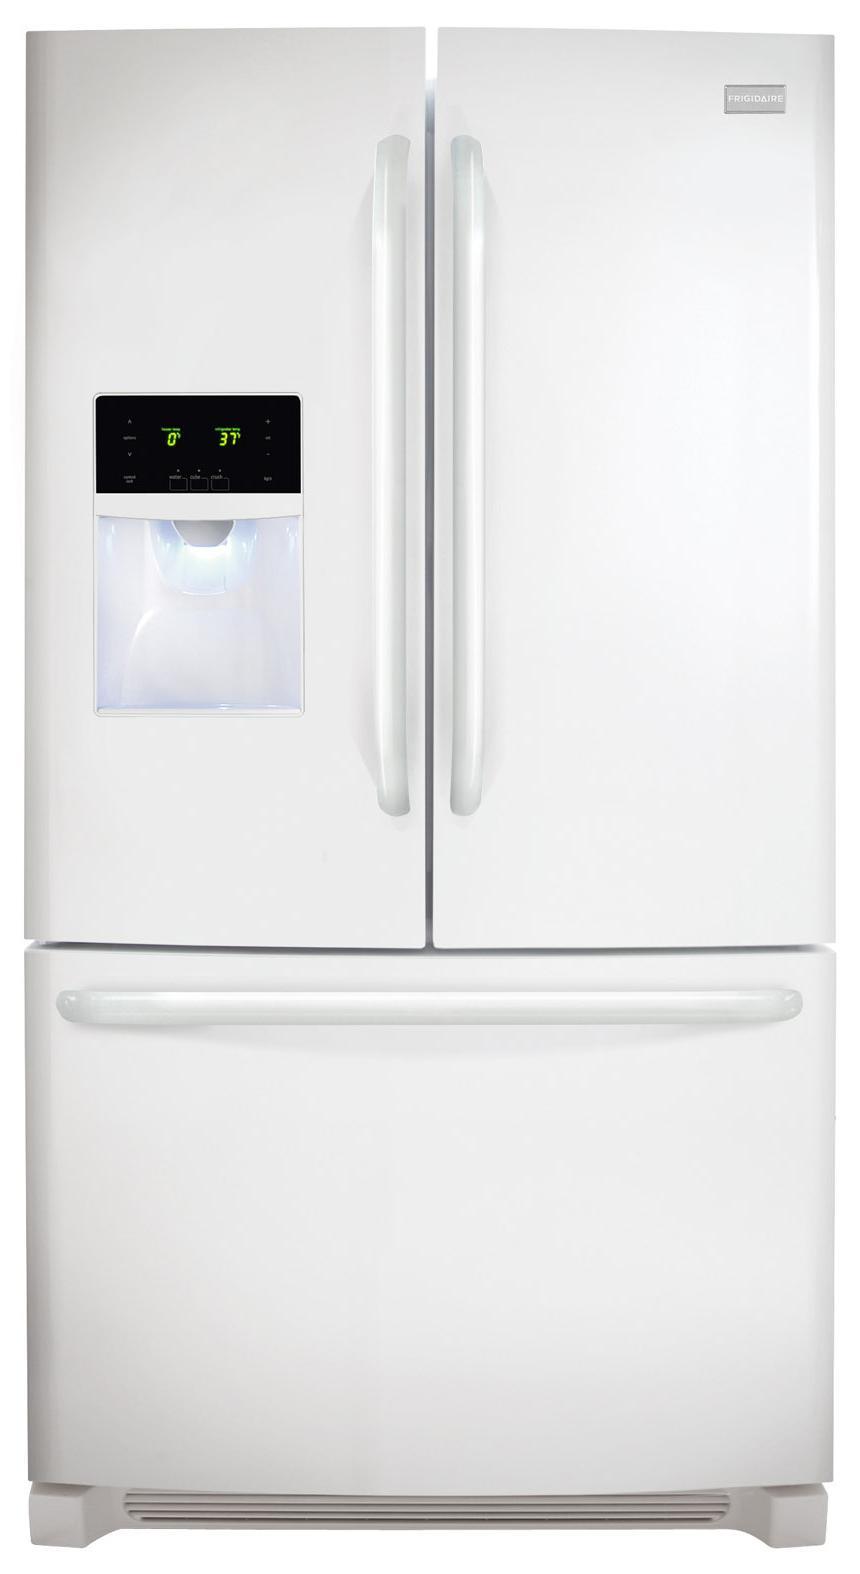 Frigidaire French Door Refrigerators 26.7 Cu. Ft. French Door Refrigerator - Item Number: FFHB2740PP